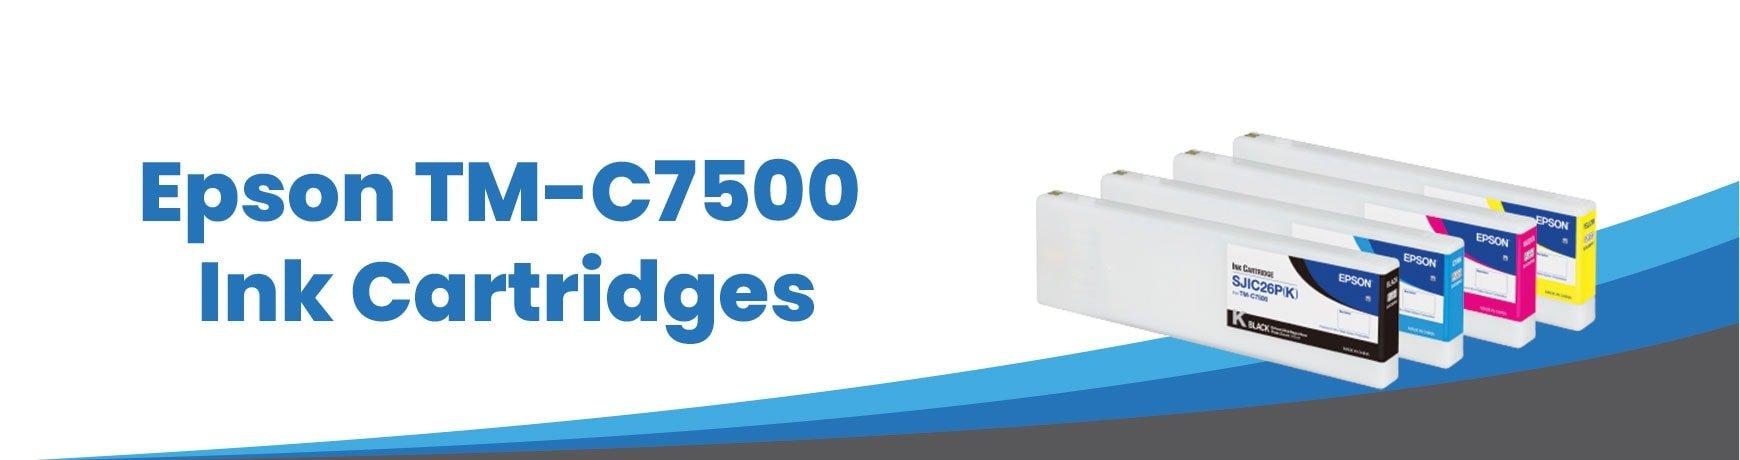 Epson TM-C7500 Ink Cartridges